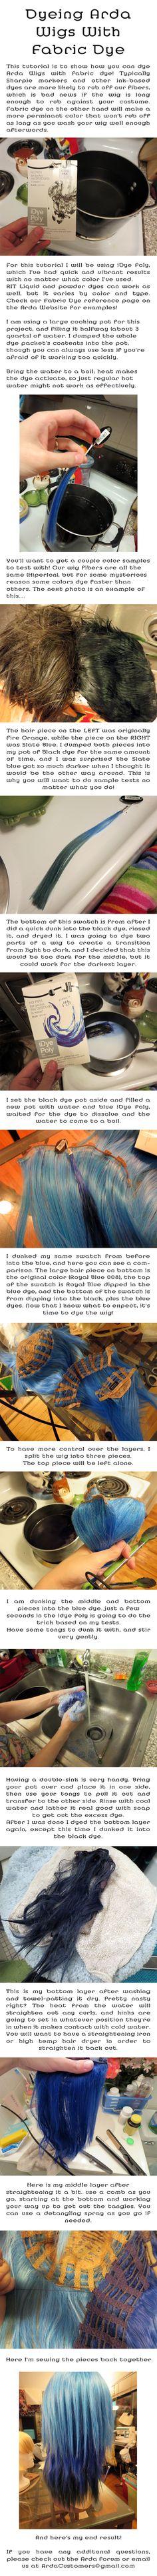 Wig Dye Tutorial by Malindachan.deviantart.com on @deviantART